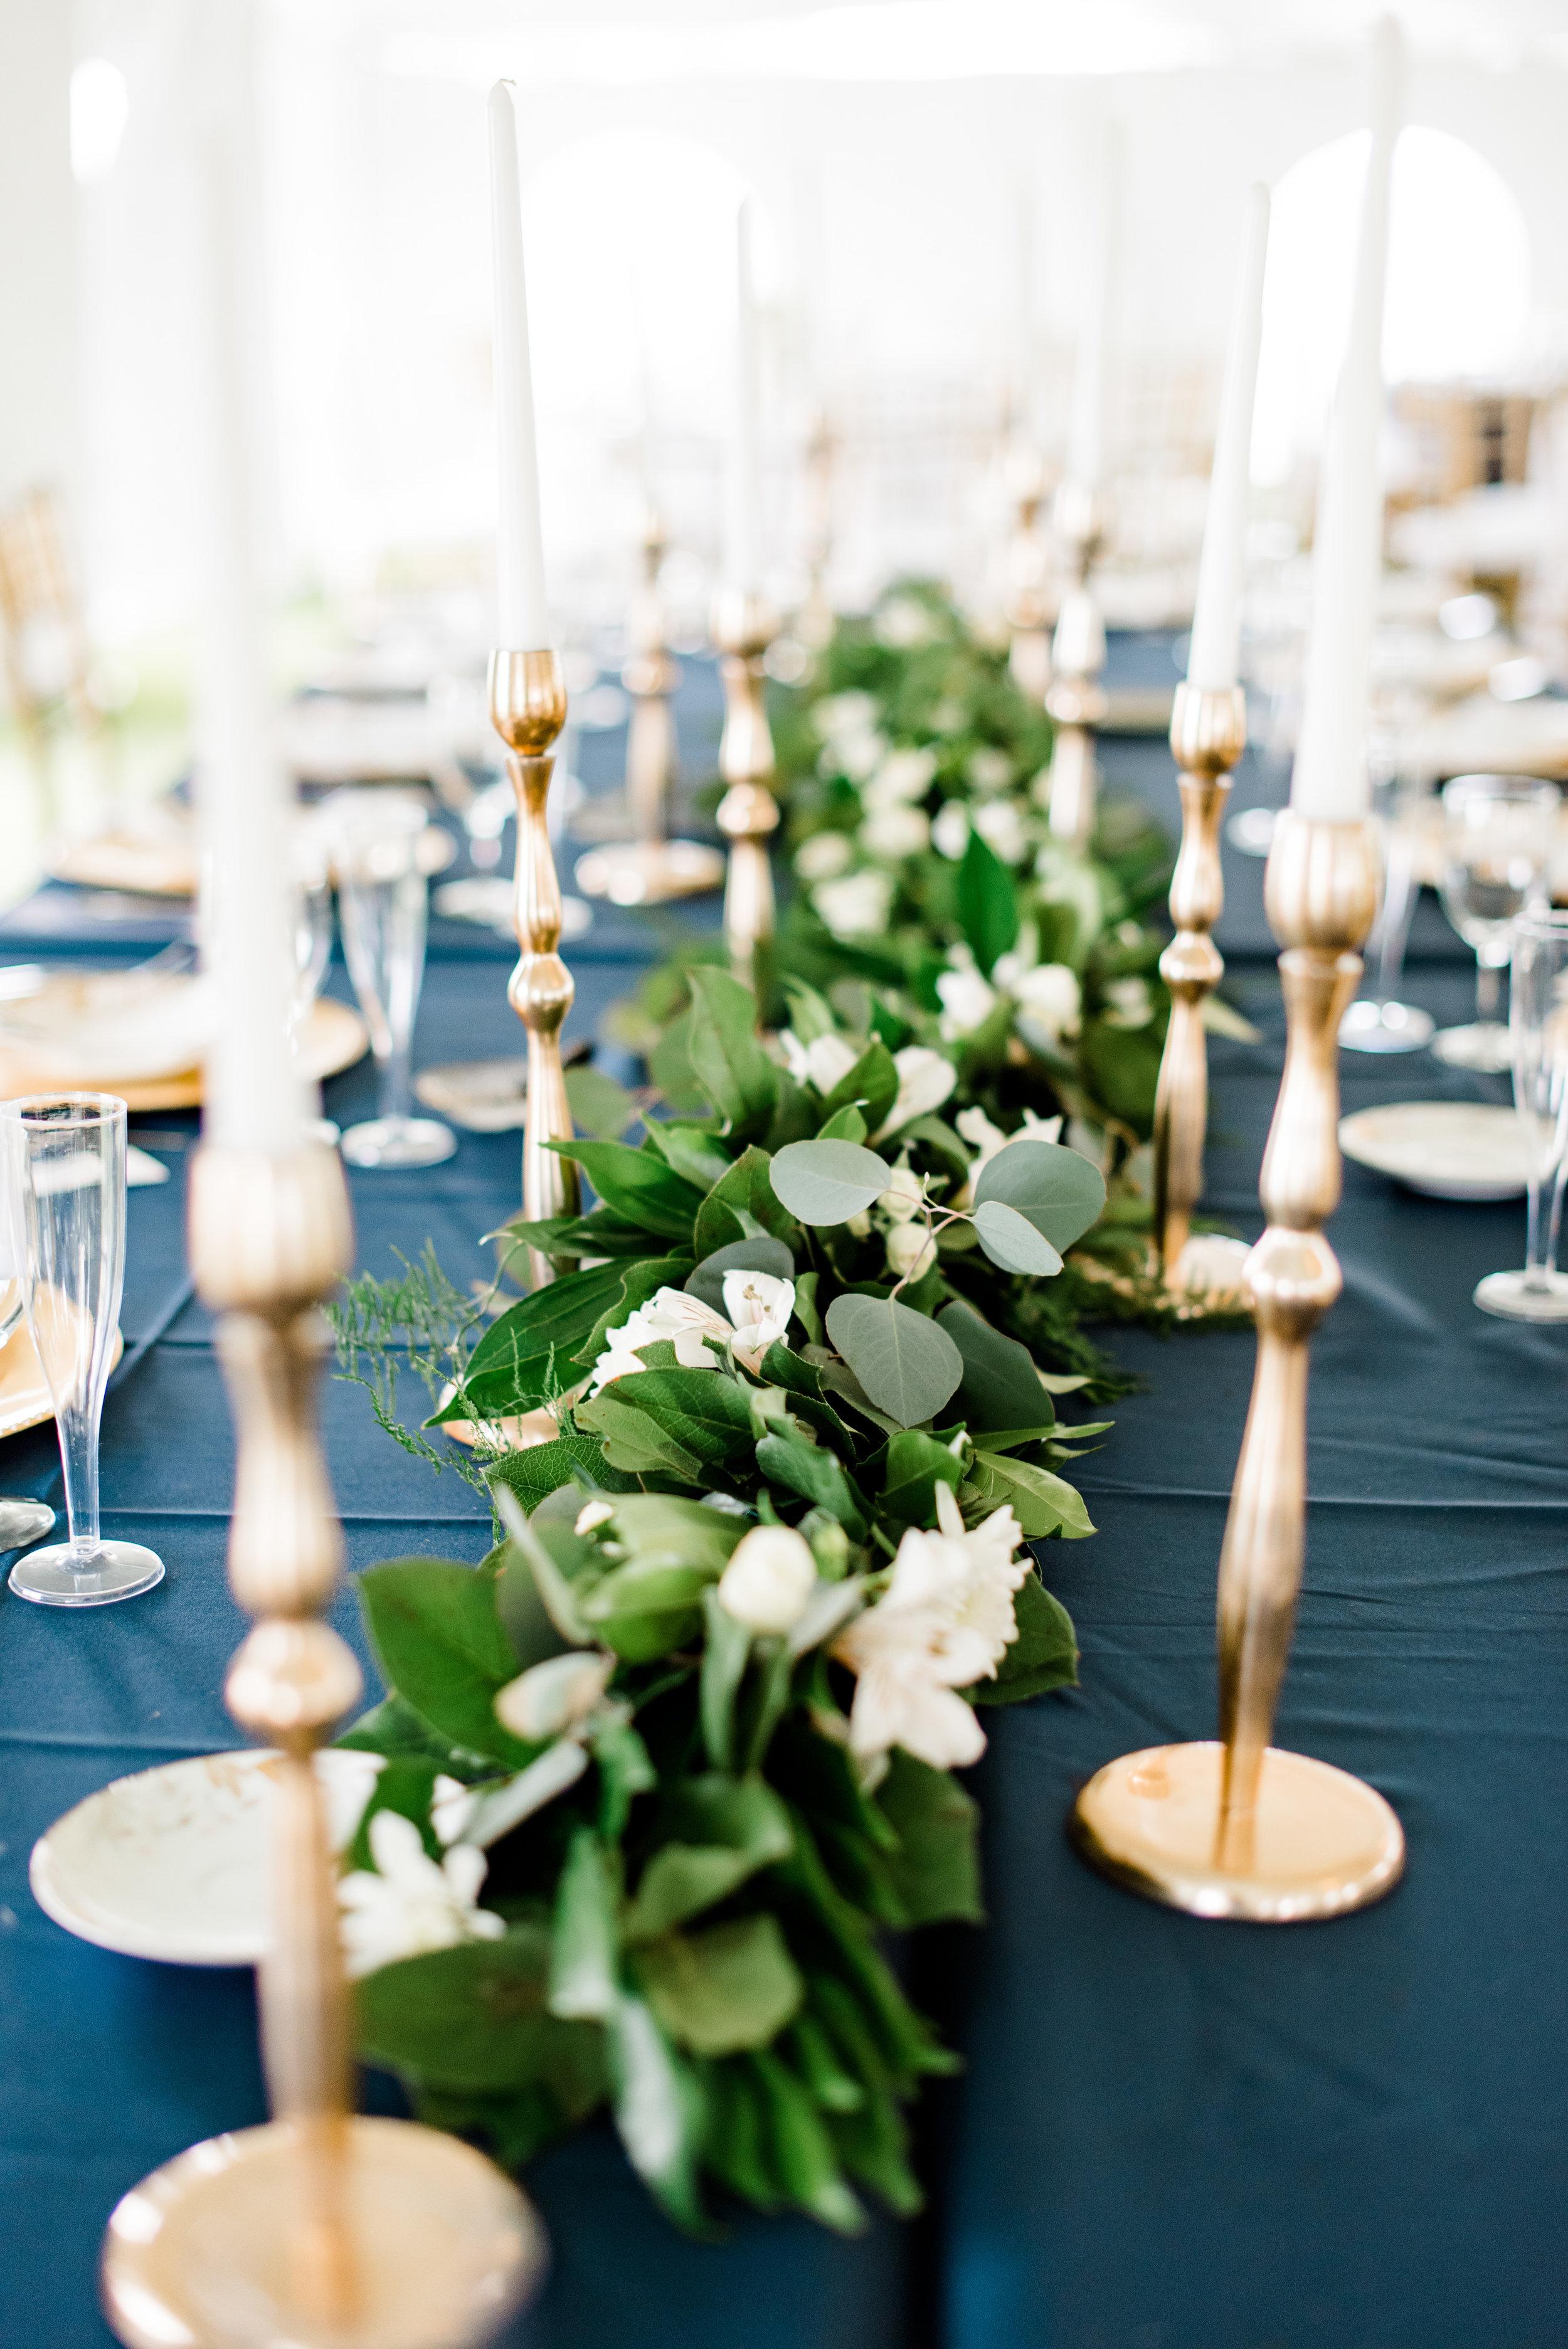 Anthony-and-stork-Weddings-280.jpg